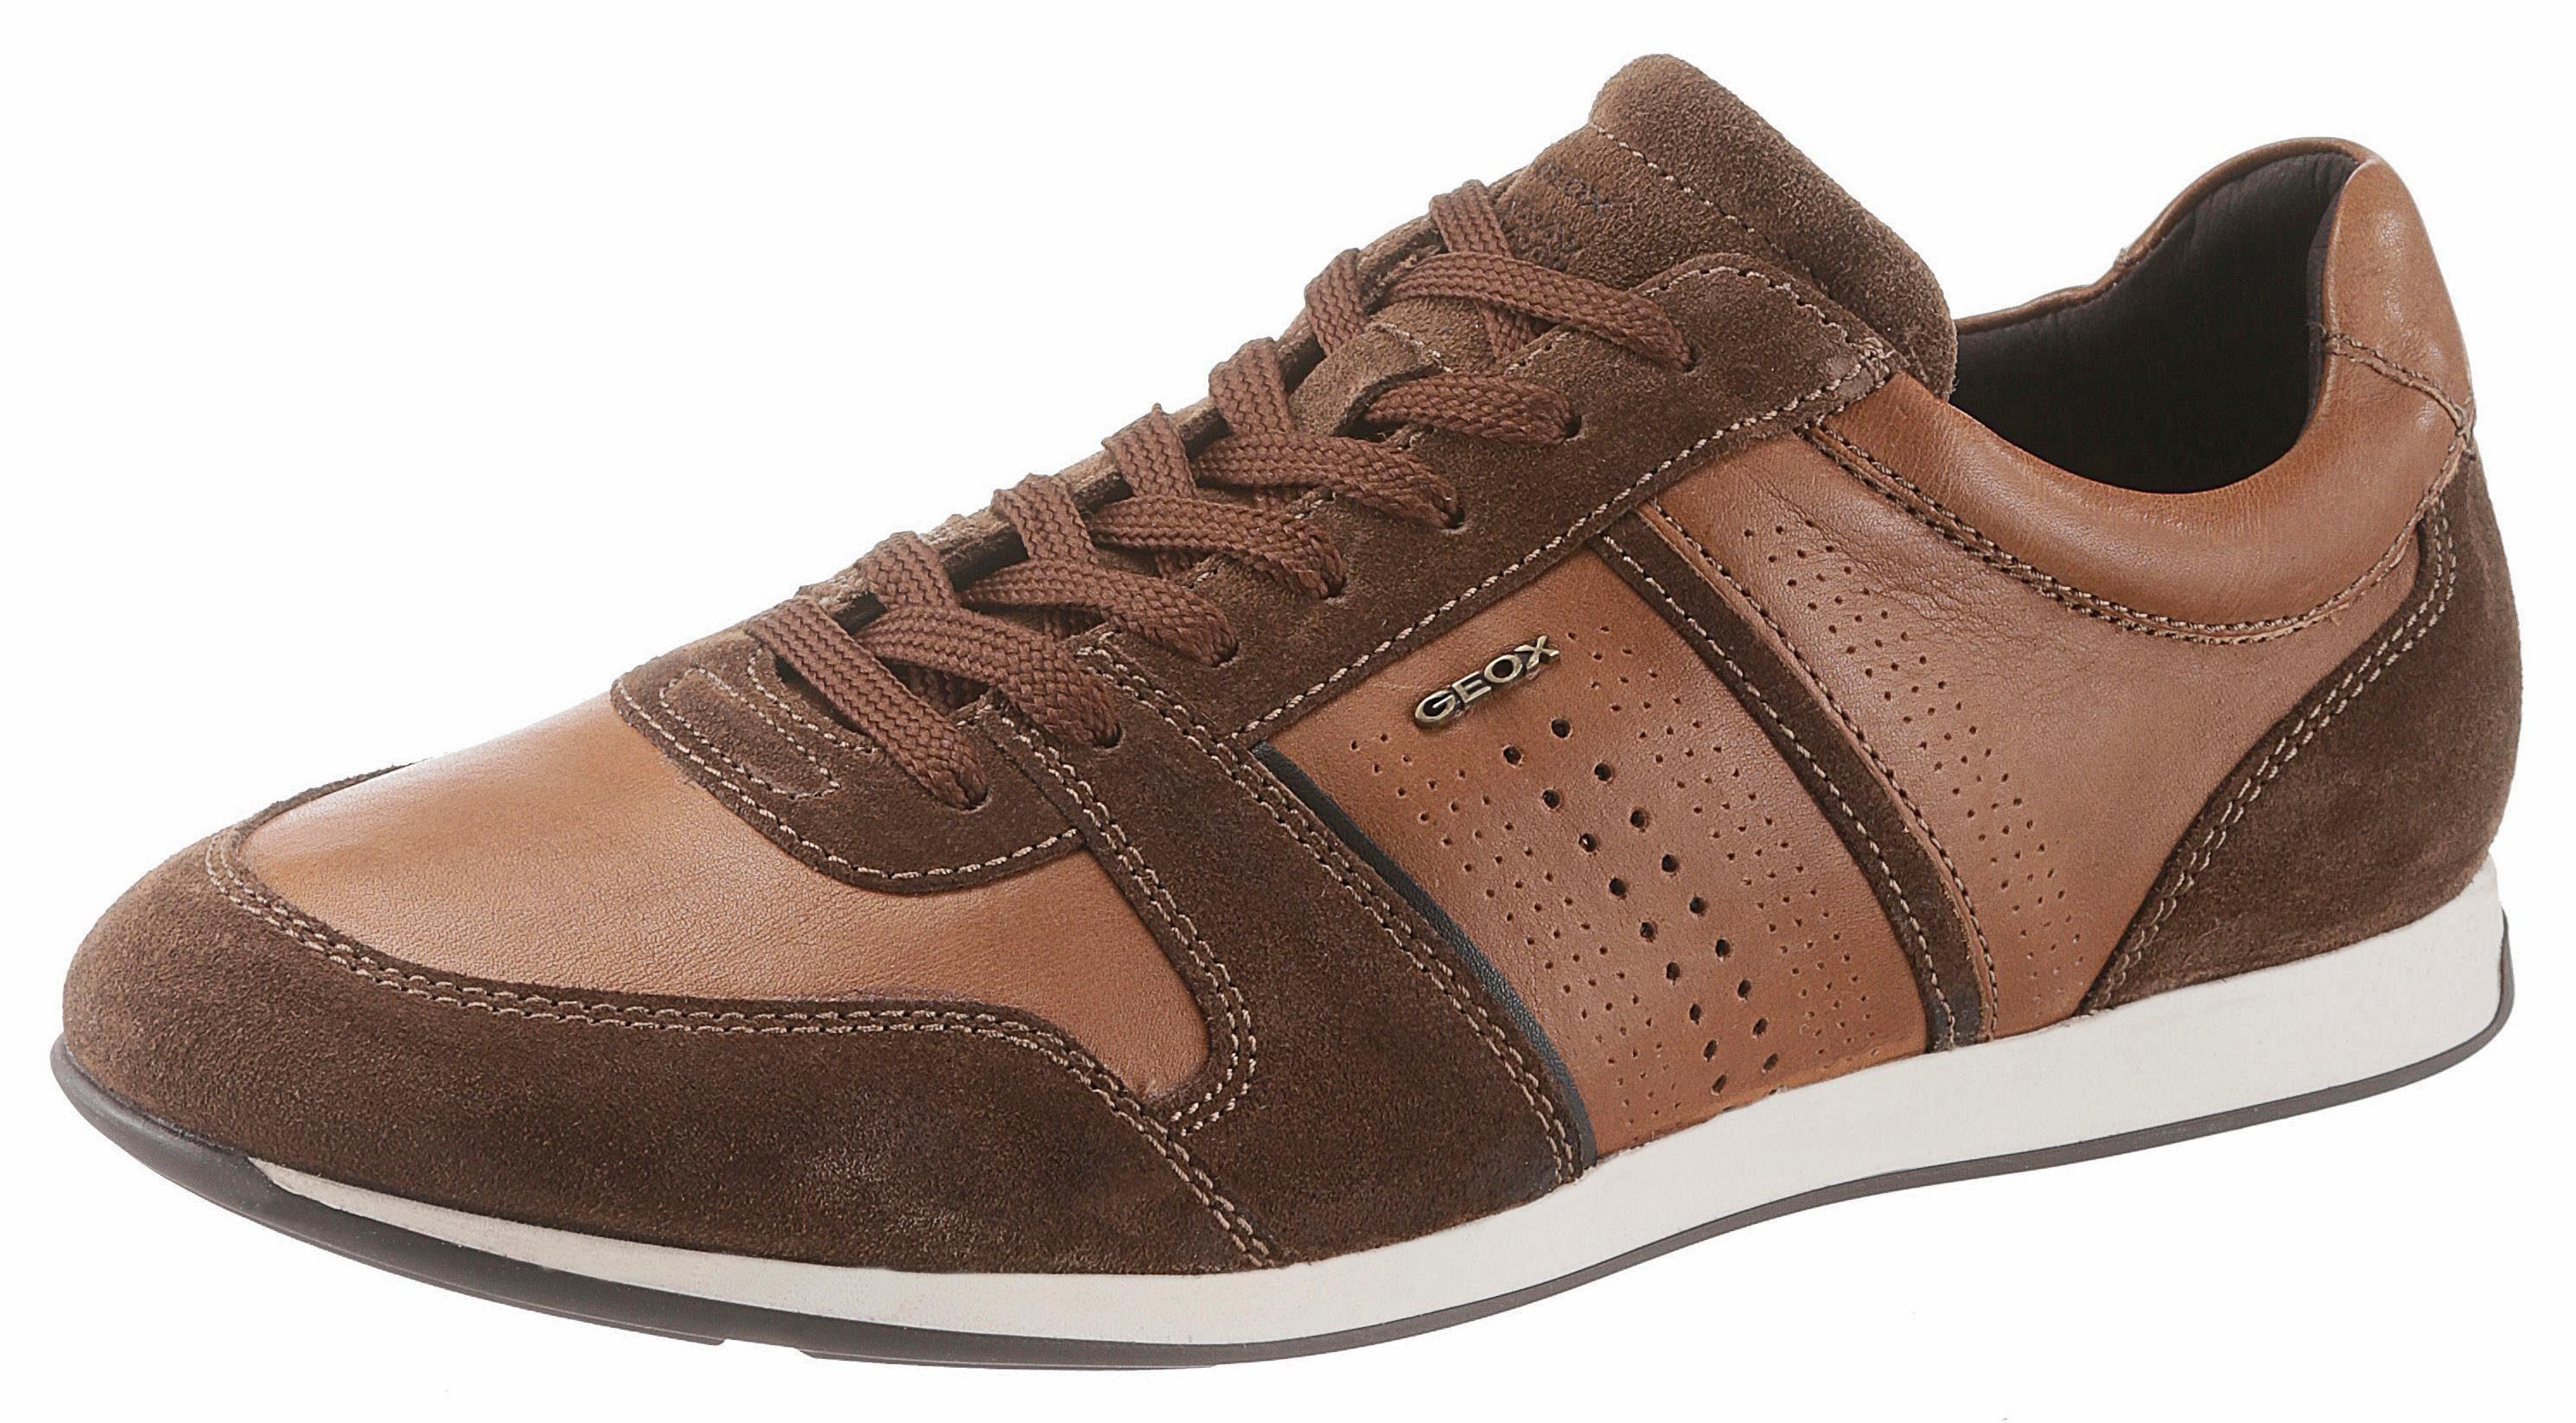 Geox Clemet Sneaker, im modischen Ledermix  braun-dunkelbraun